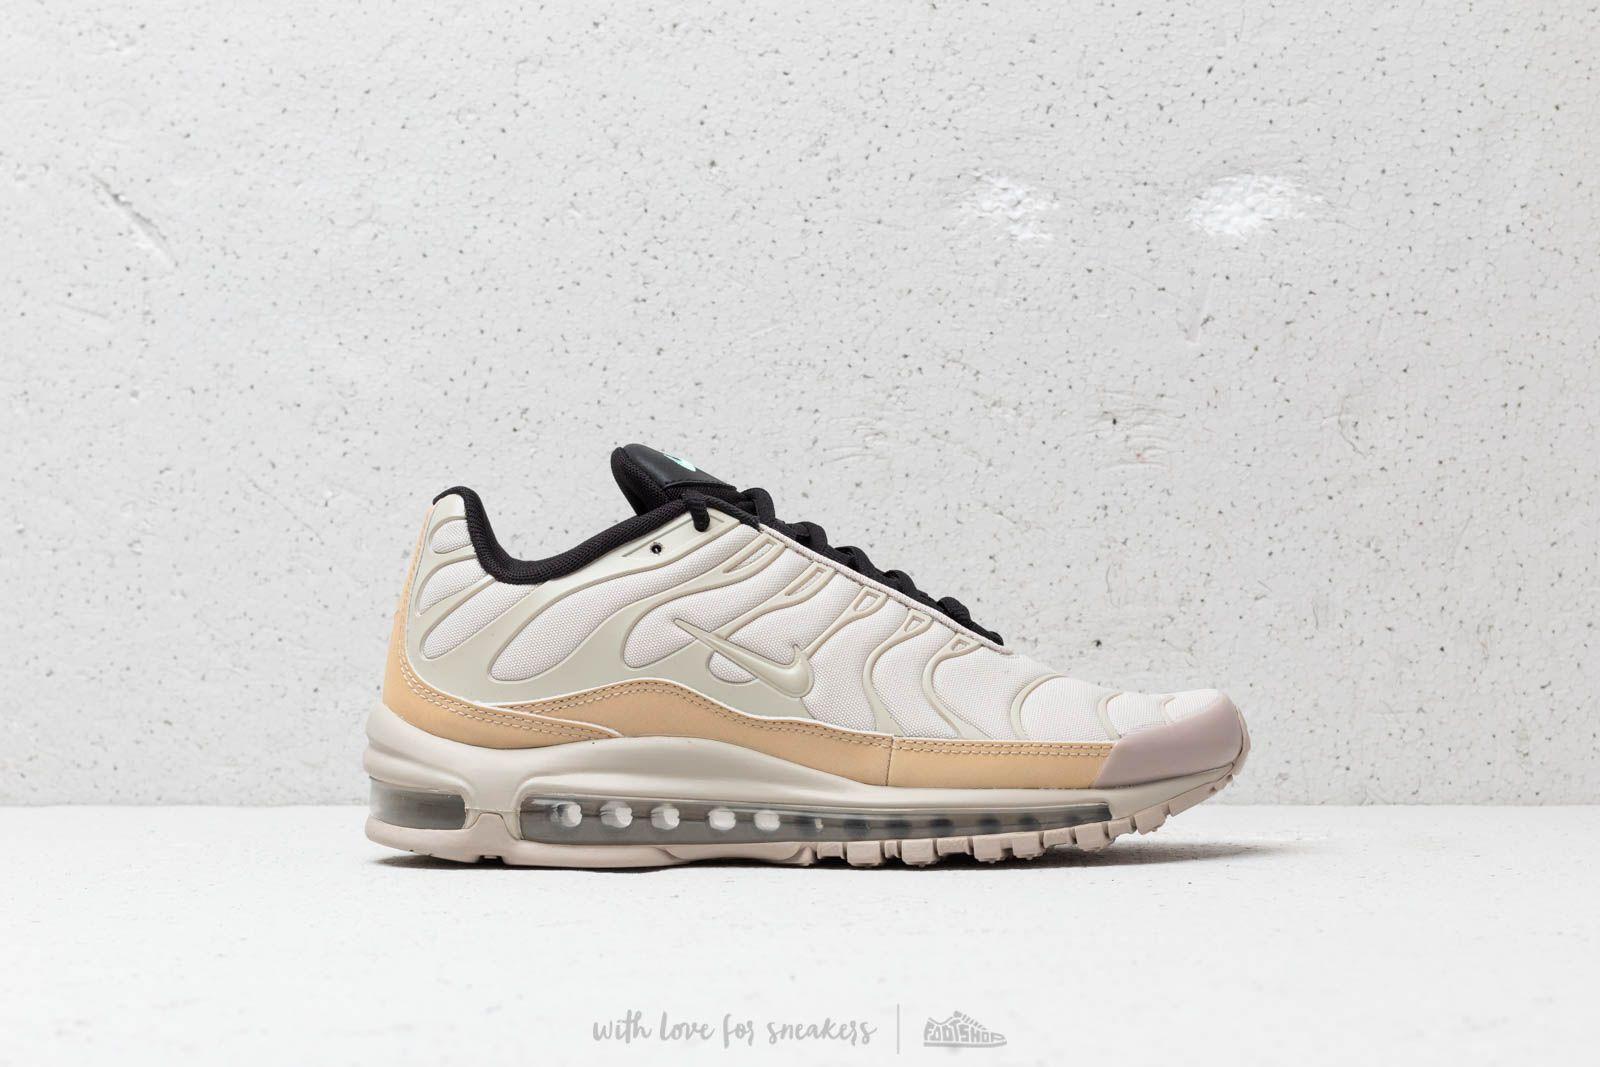 Nike Air Max 97/Plus Light Orewood Brown/ Rattan-String | Footshop